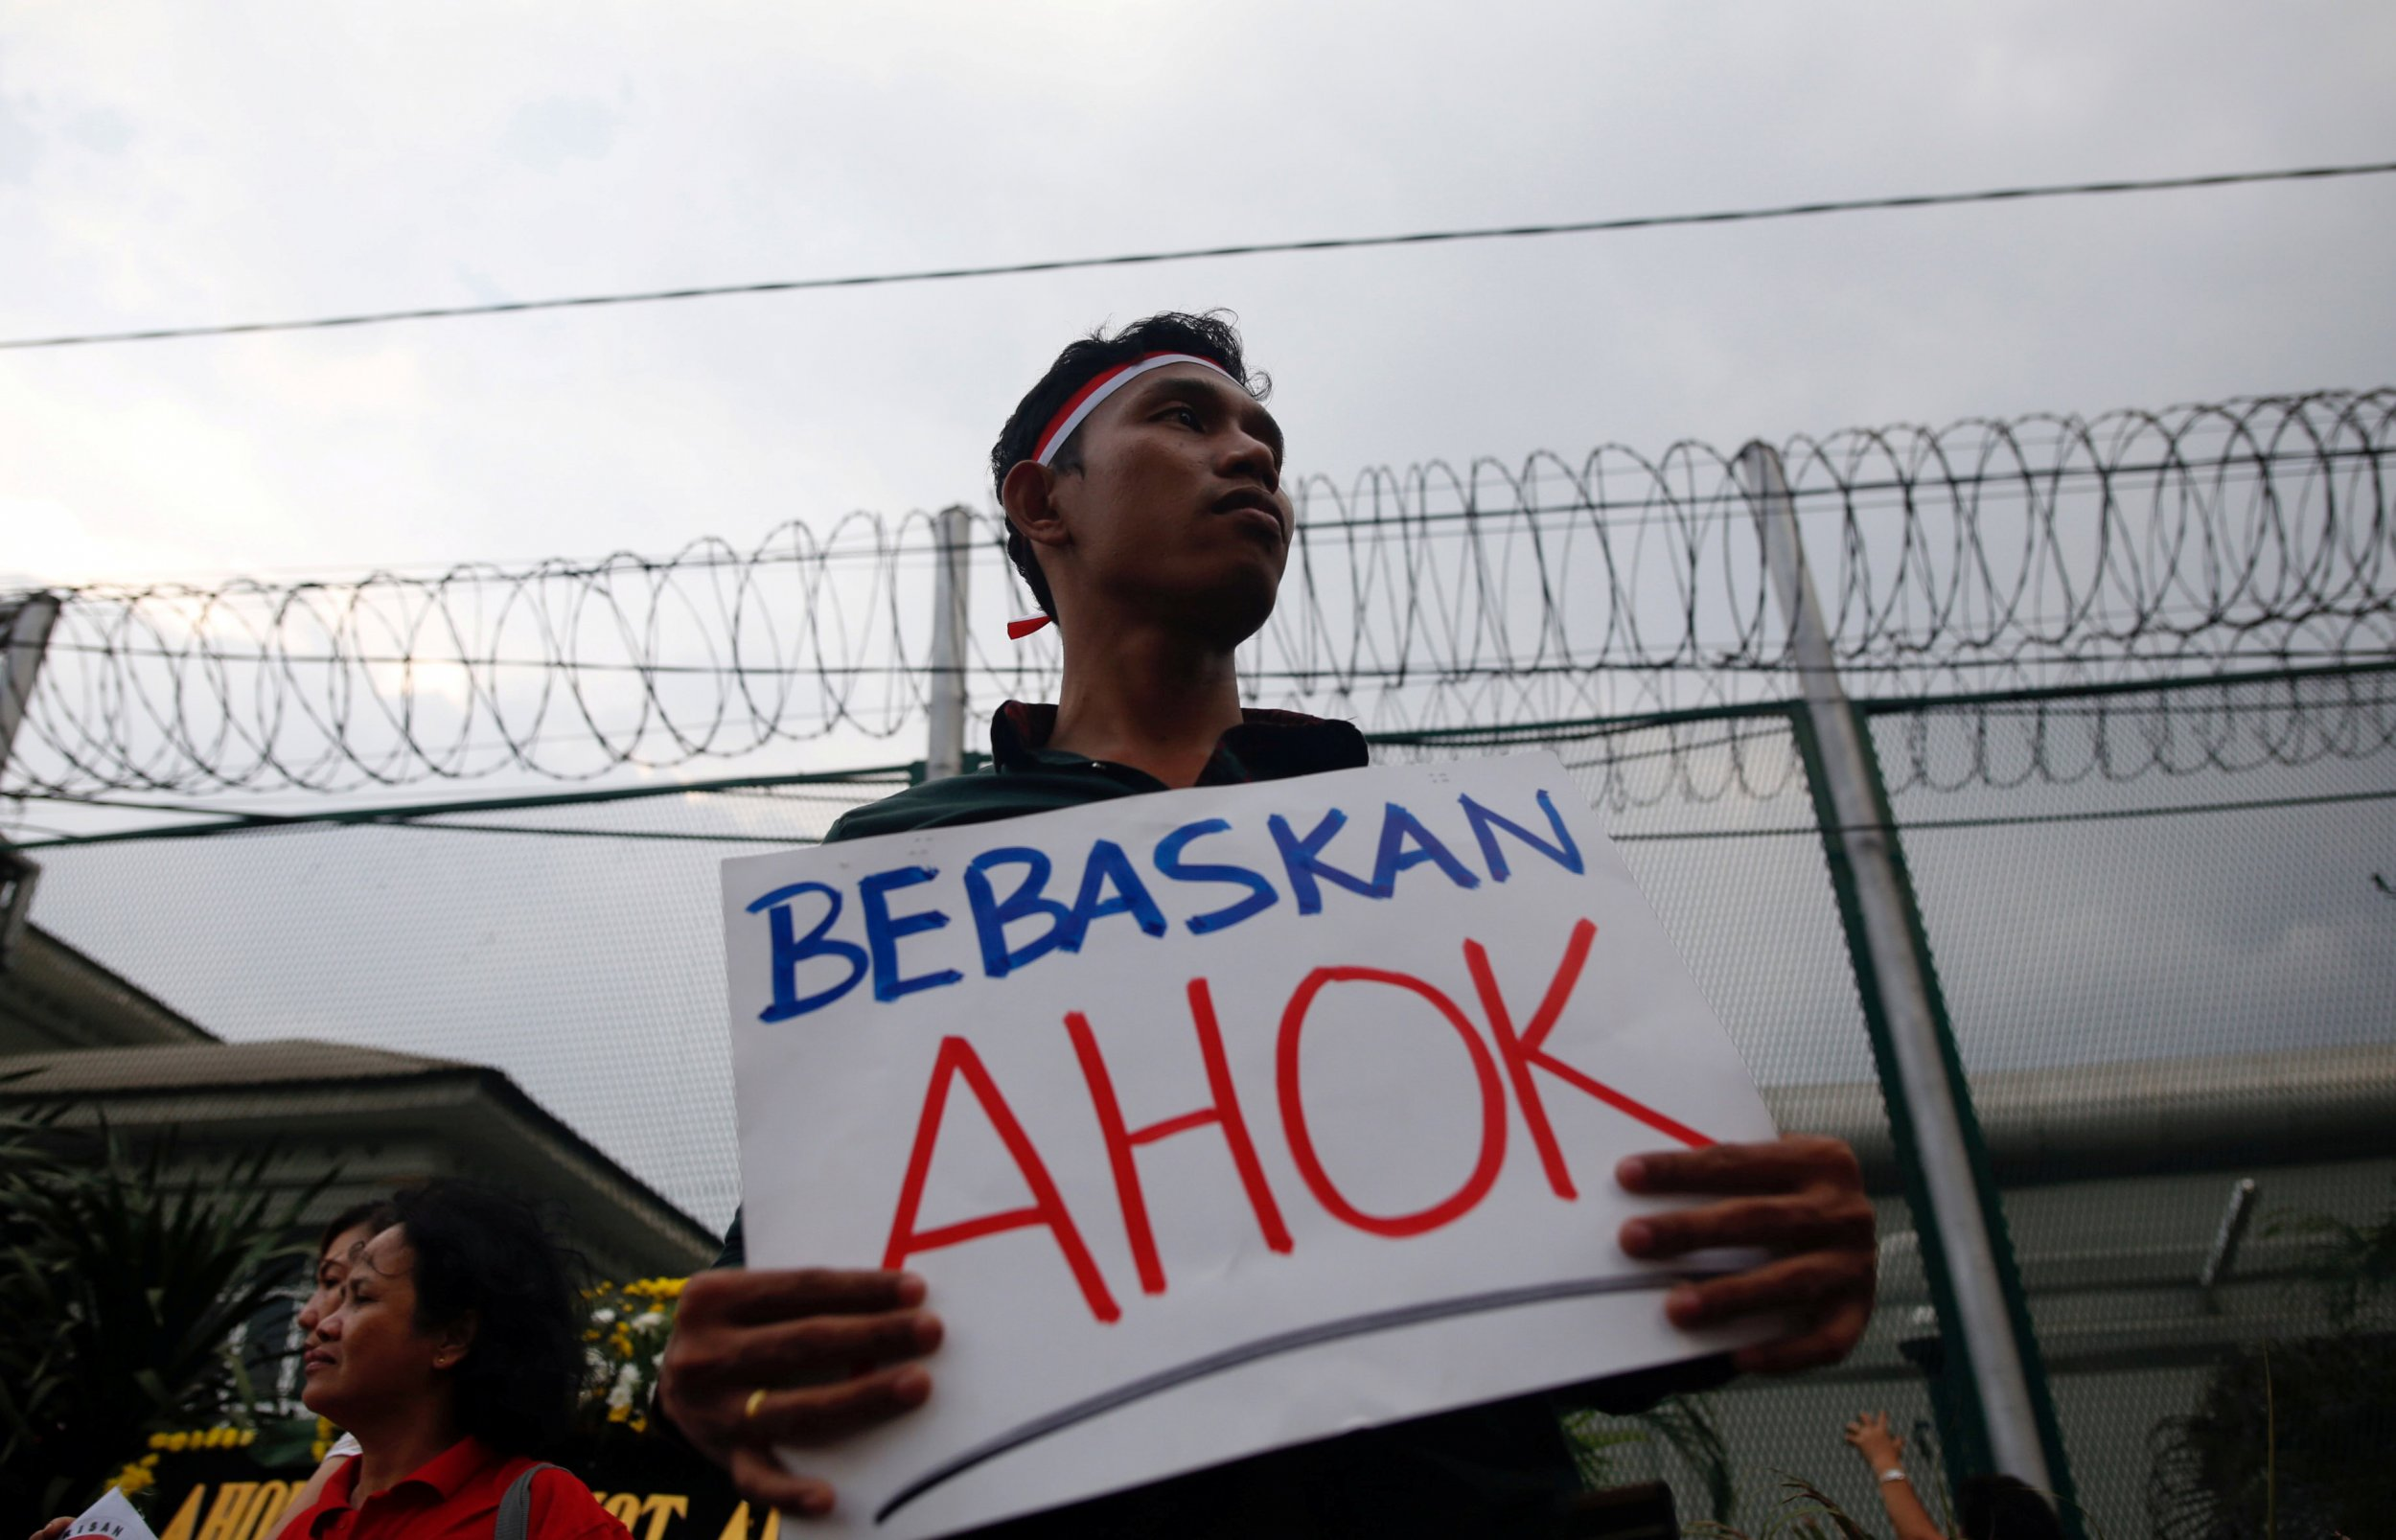 Jakarta governors blasphemy conviction shows democracy and man protesting ahok stopboris Choice Image